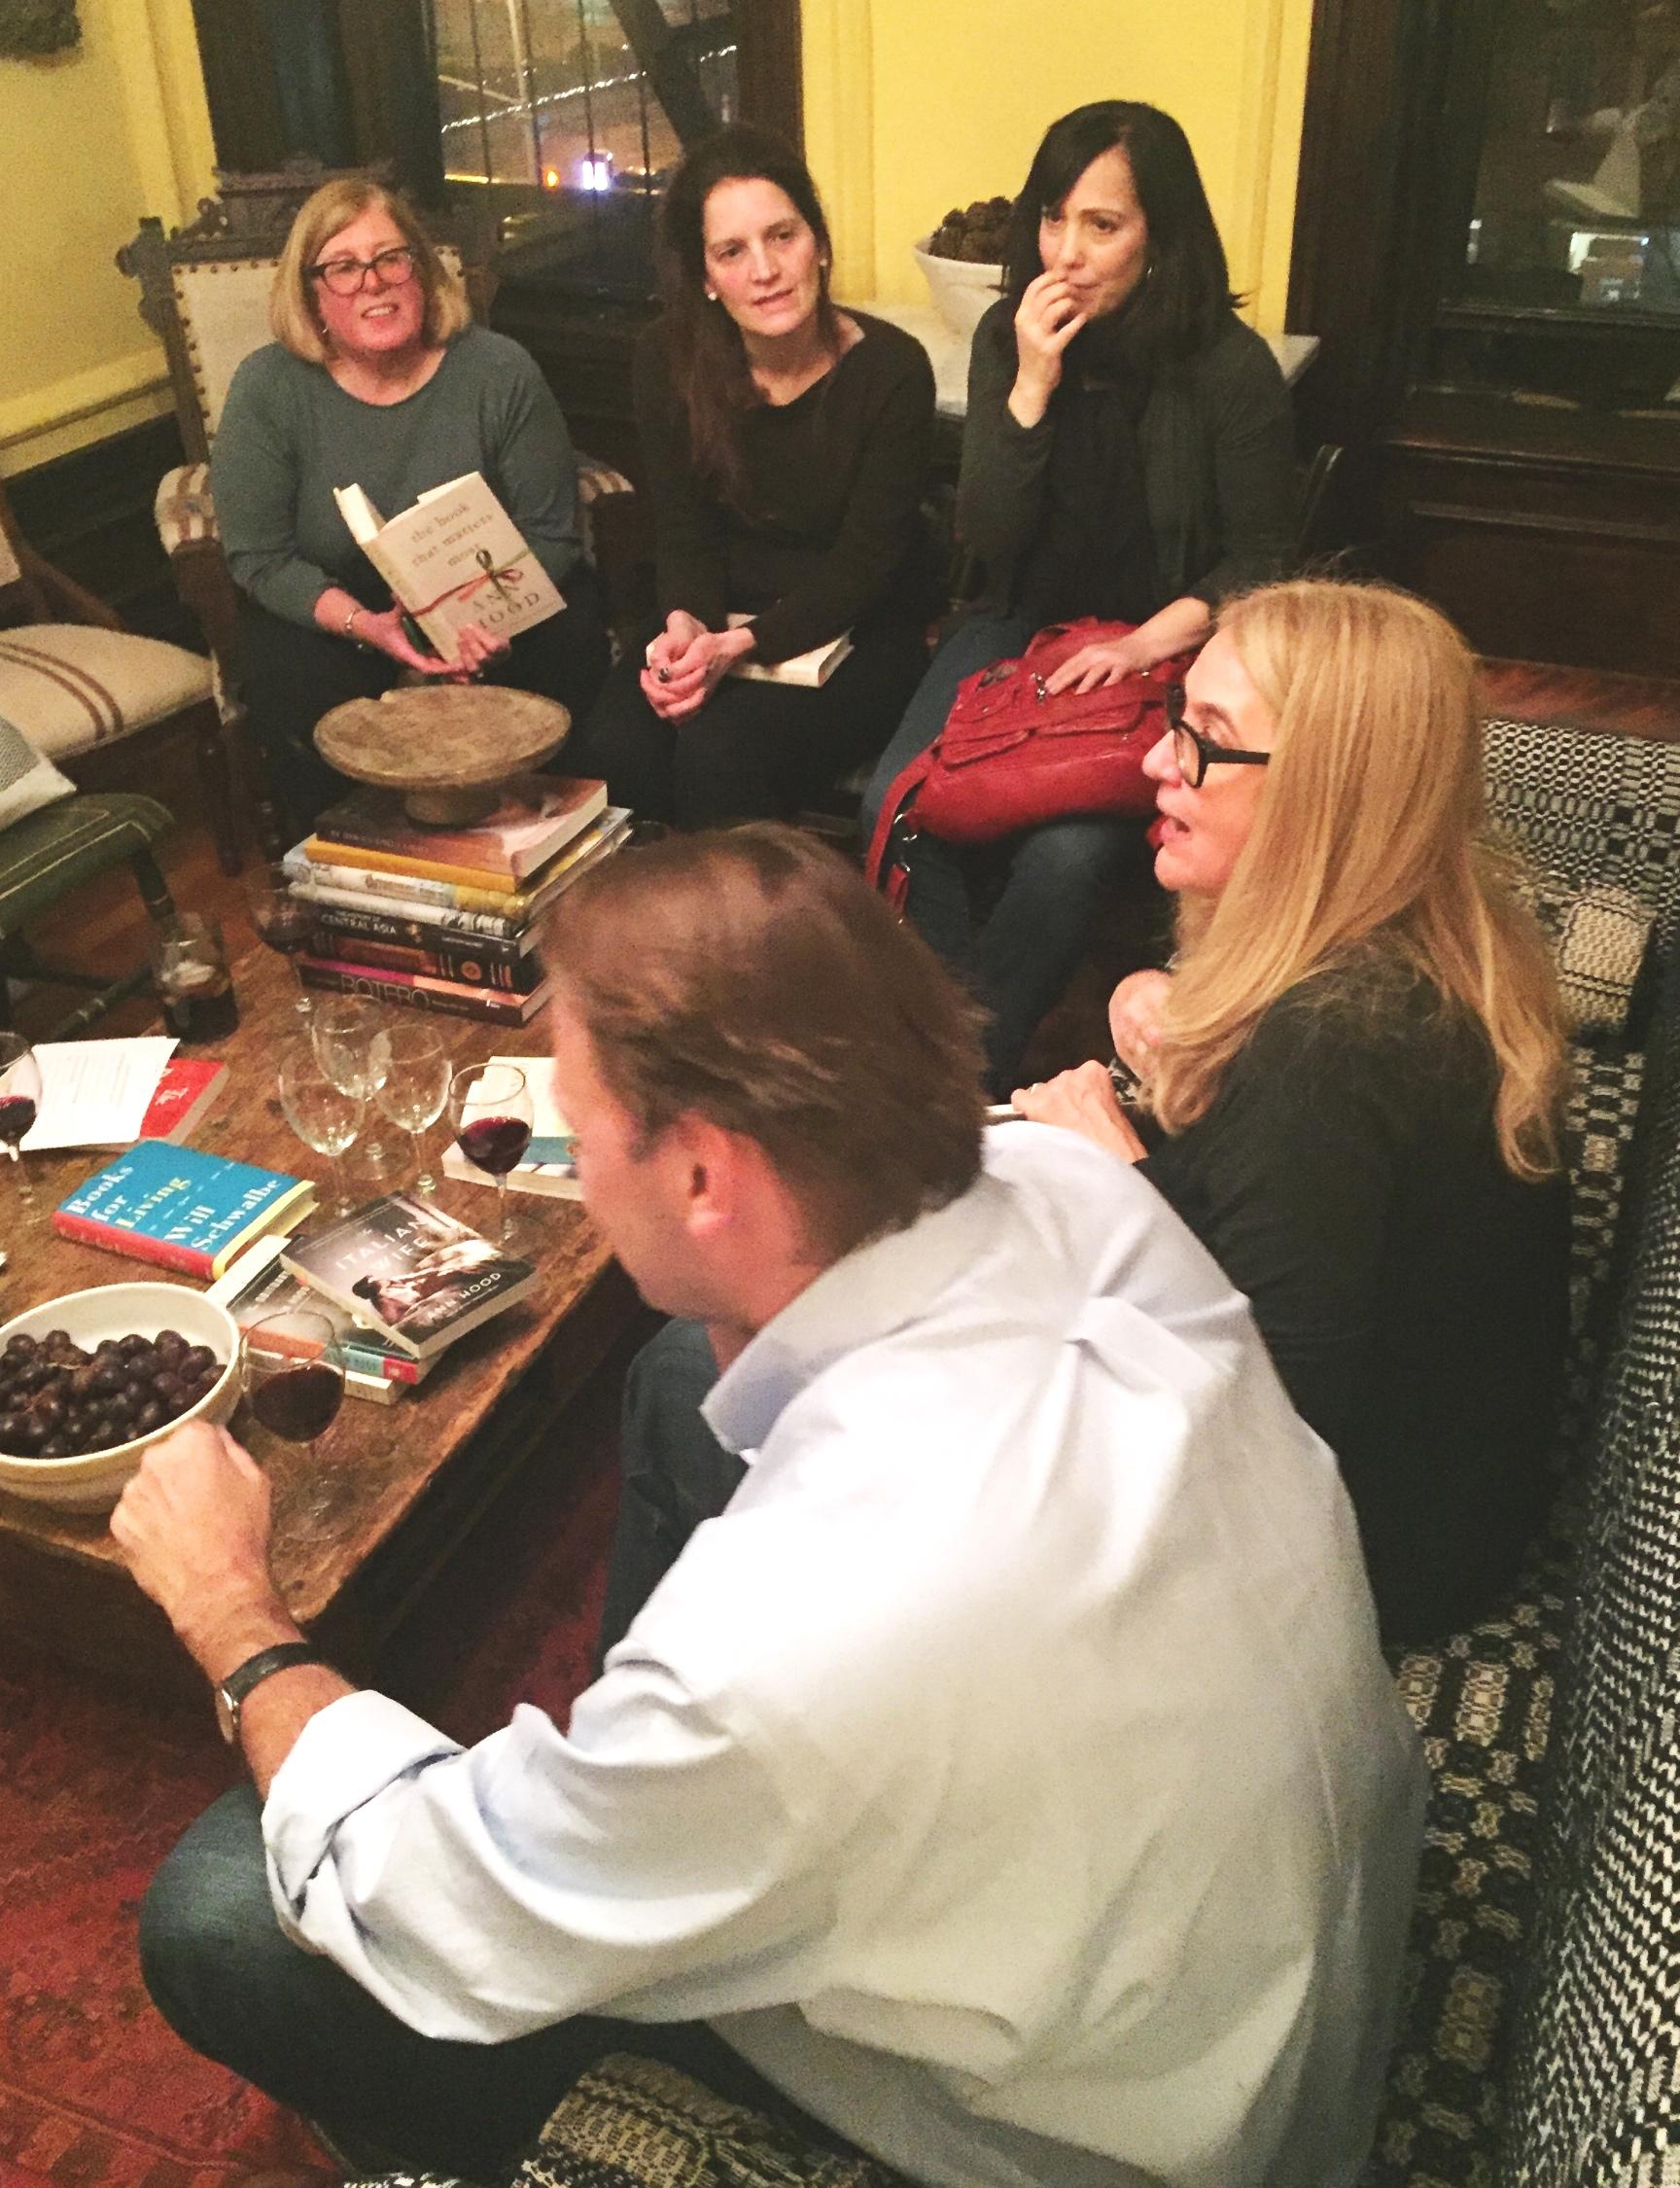 Novelist Ann Hood discusses THE BOOK THAT MATTERS MOST